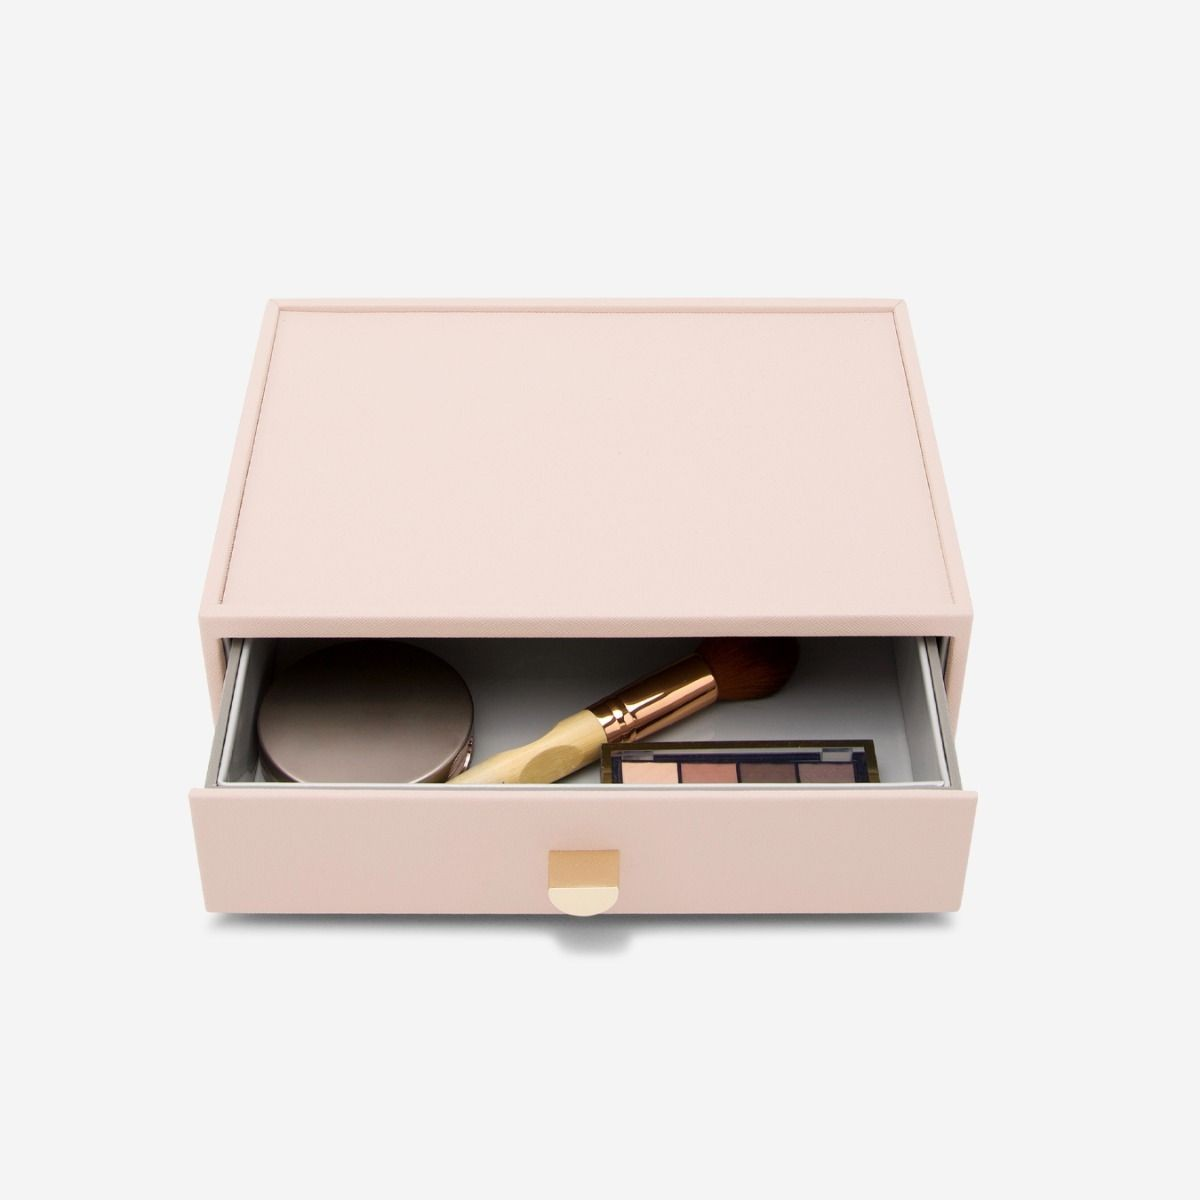 Ящик для косметики LC Designs Co. Ltd. арт.74543